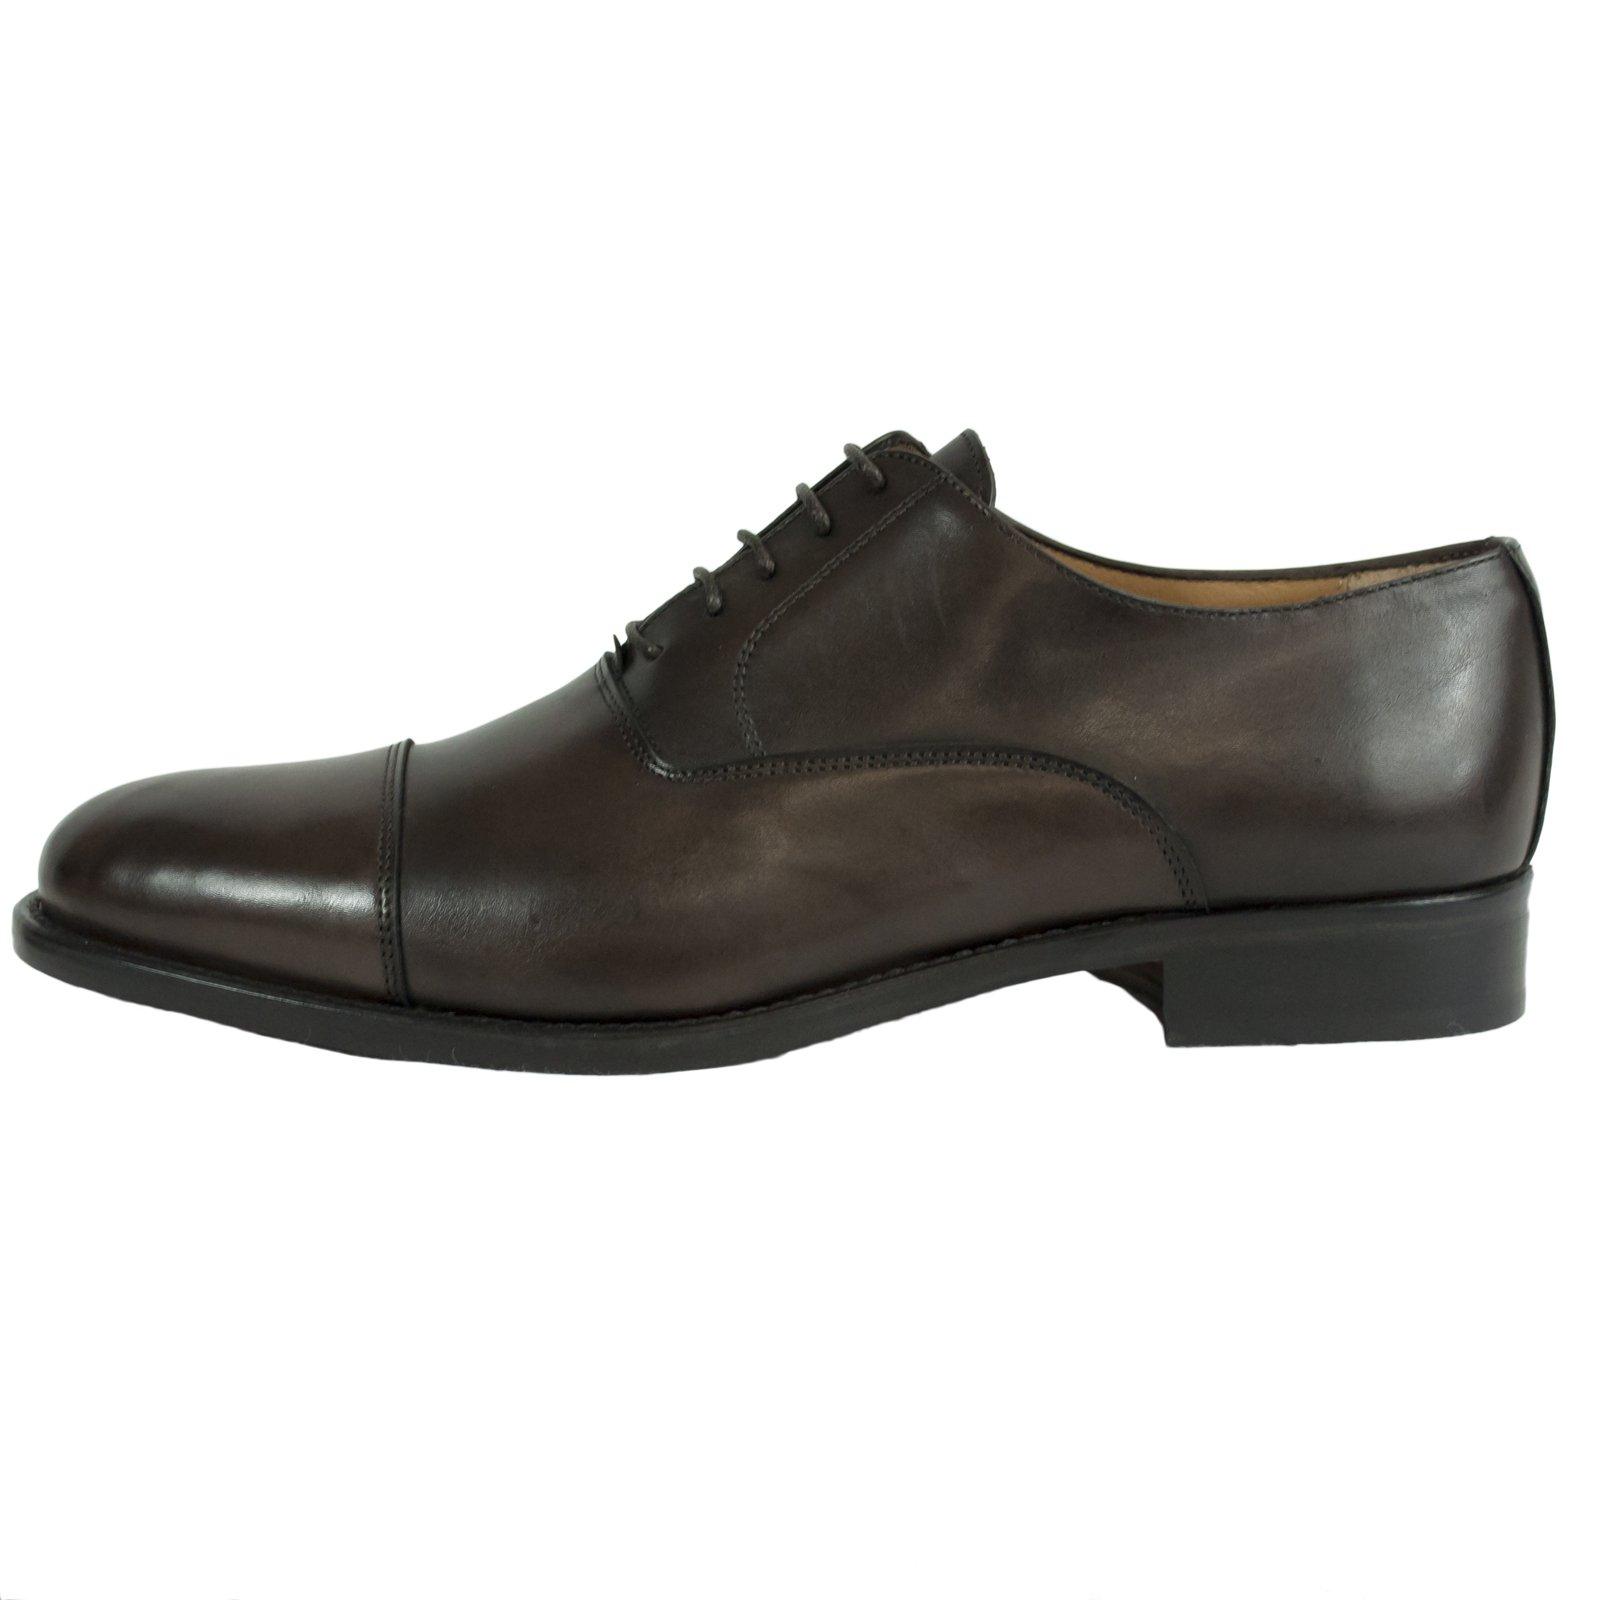 Saxone of Scotland Men's Leather Laced Oxford Shoe Brown 350_Dark_Brown_Calf - EU42/US9